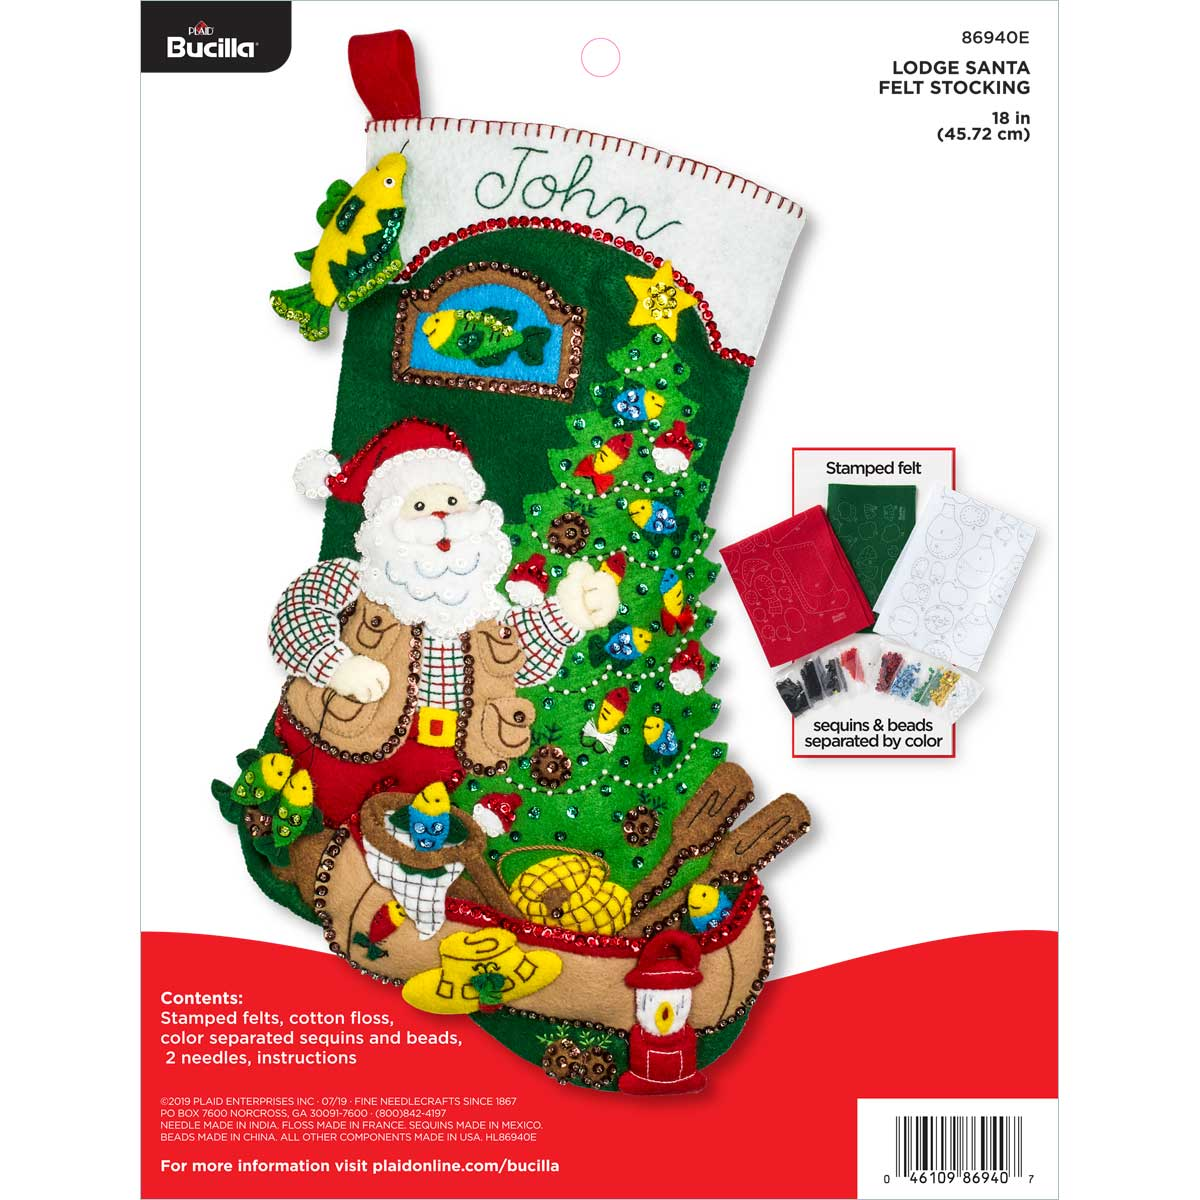 Bucilla ® Seasonal - Felt - Stocking Kits - Lodge Santa